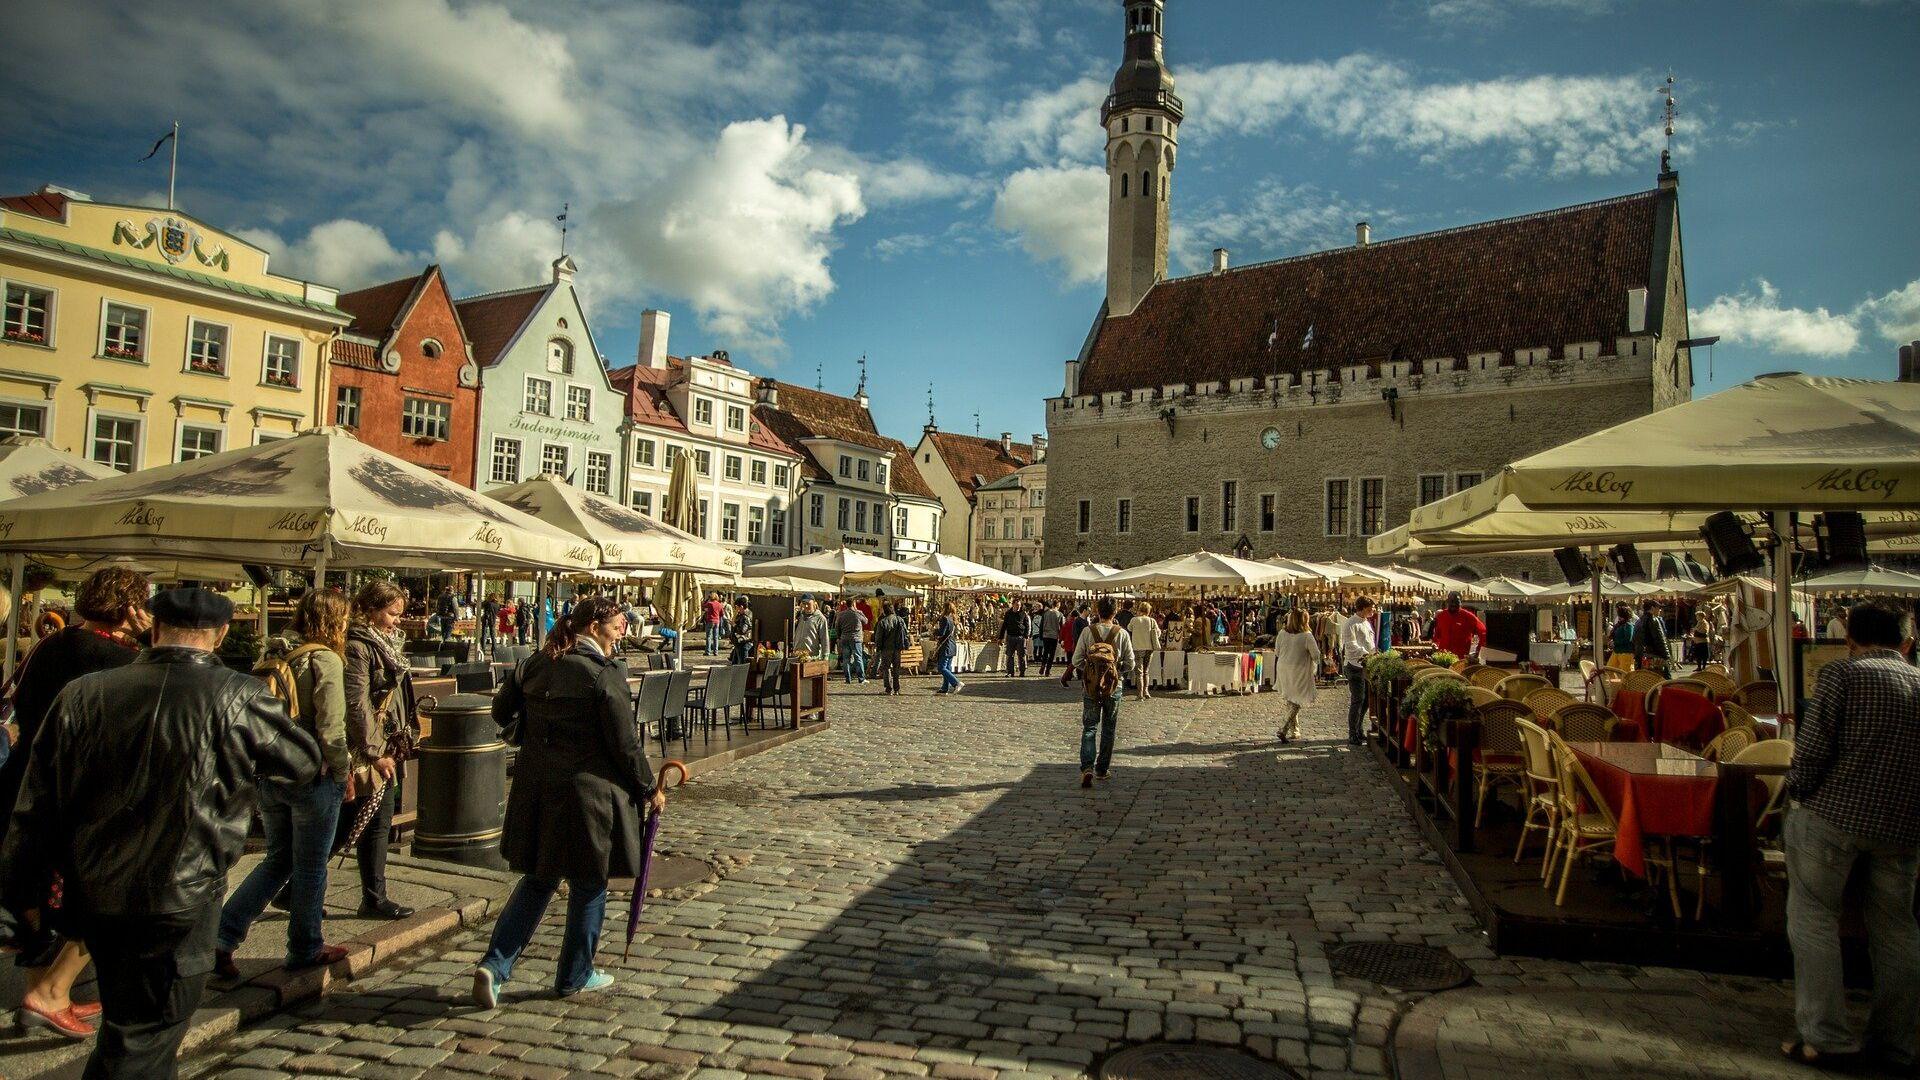 Исторический центр Таллина, Эстония  - РИА Новости, 1920, 17.07.2021